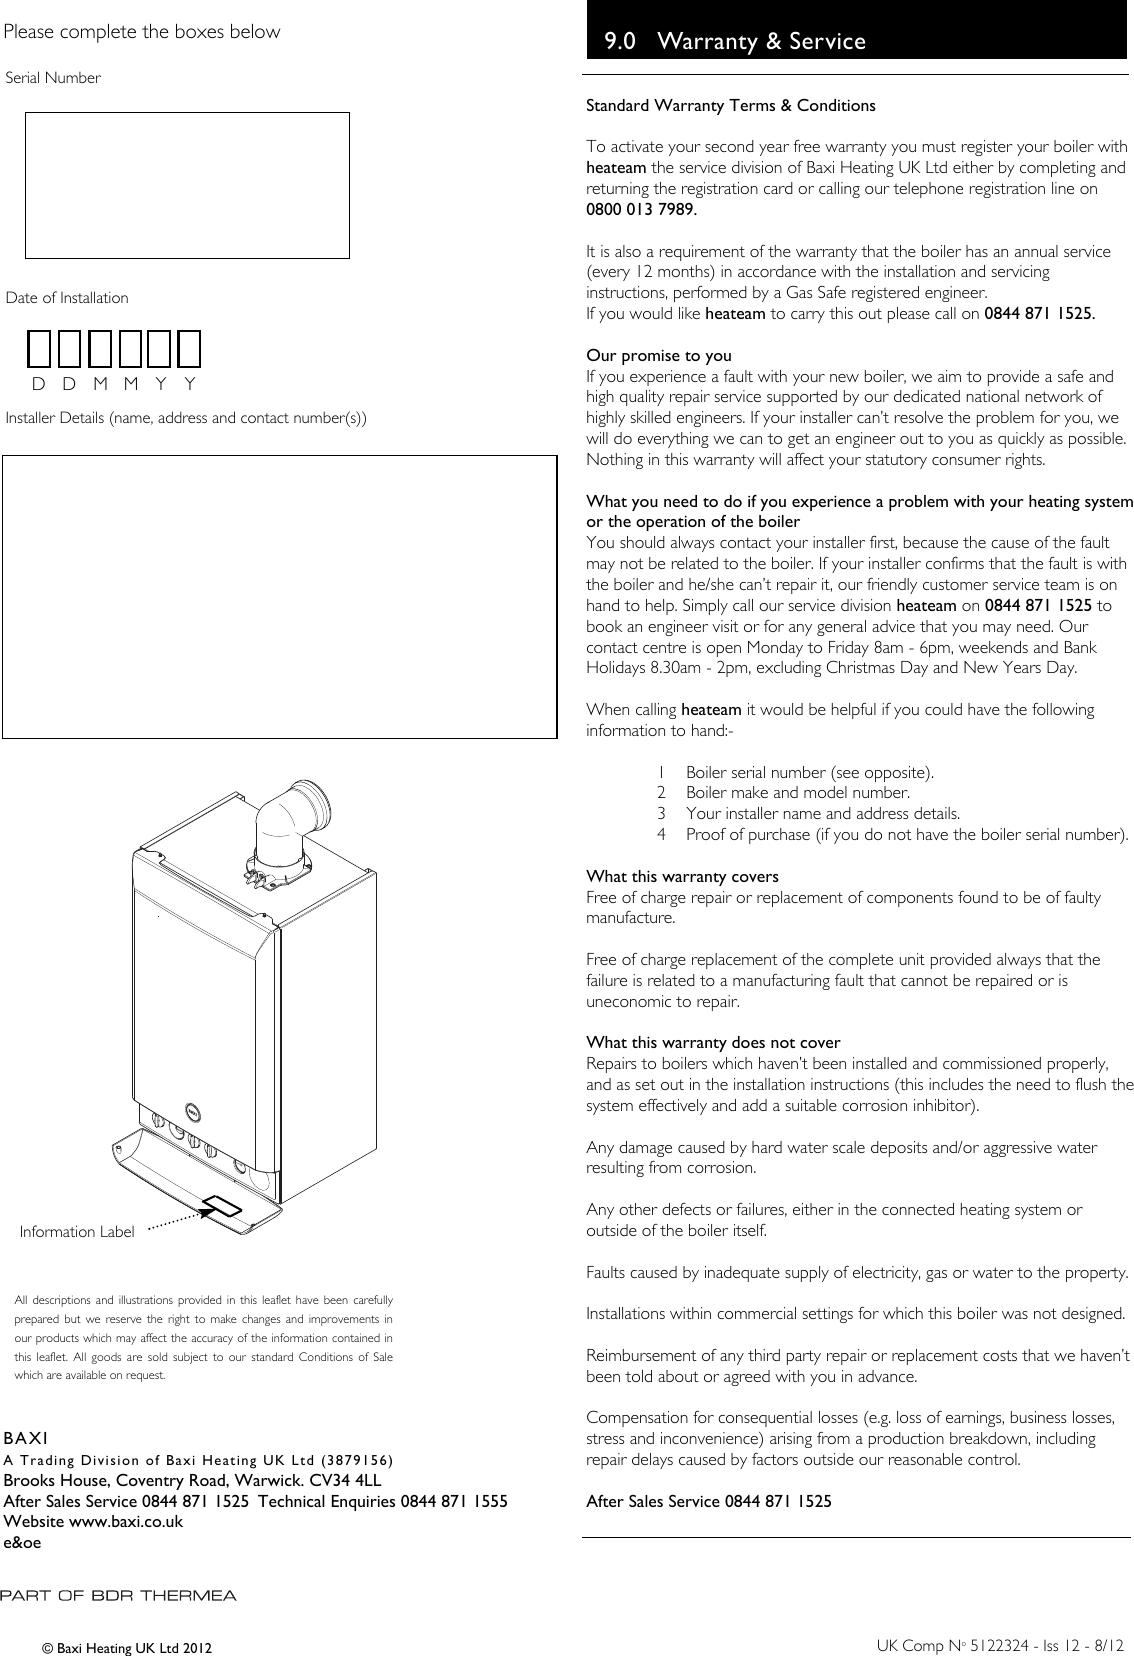 Vaillant vcw t3w combi boiler 1958 chevy bel air wiring diagram tao exelent combi boiler wiring diagram inspiration electrical diagram baxiduoteccombiheaownersmanual combi boiler wiring diagram vaillant vcw t3w combi boiler asfbconference2016 Gallery